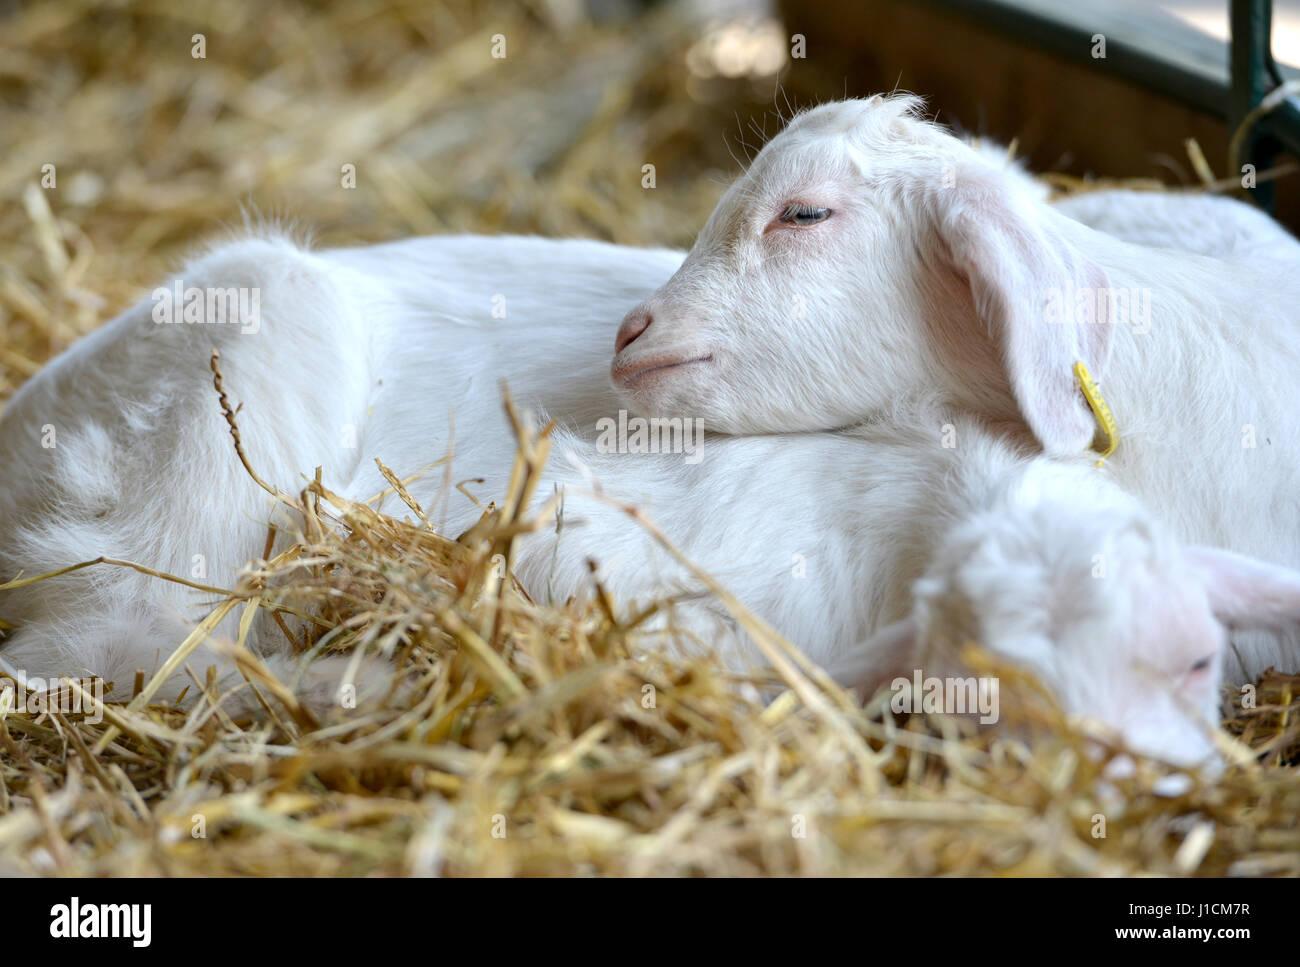 Chèvres bébé dormir ensemble fermer Photo Stock